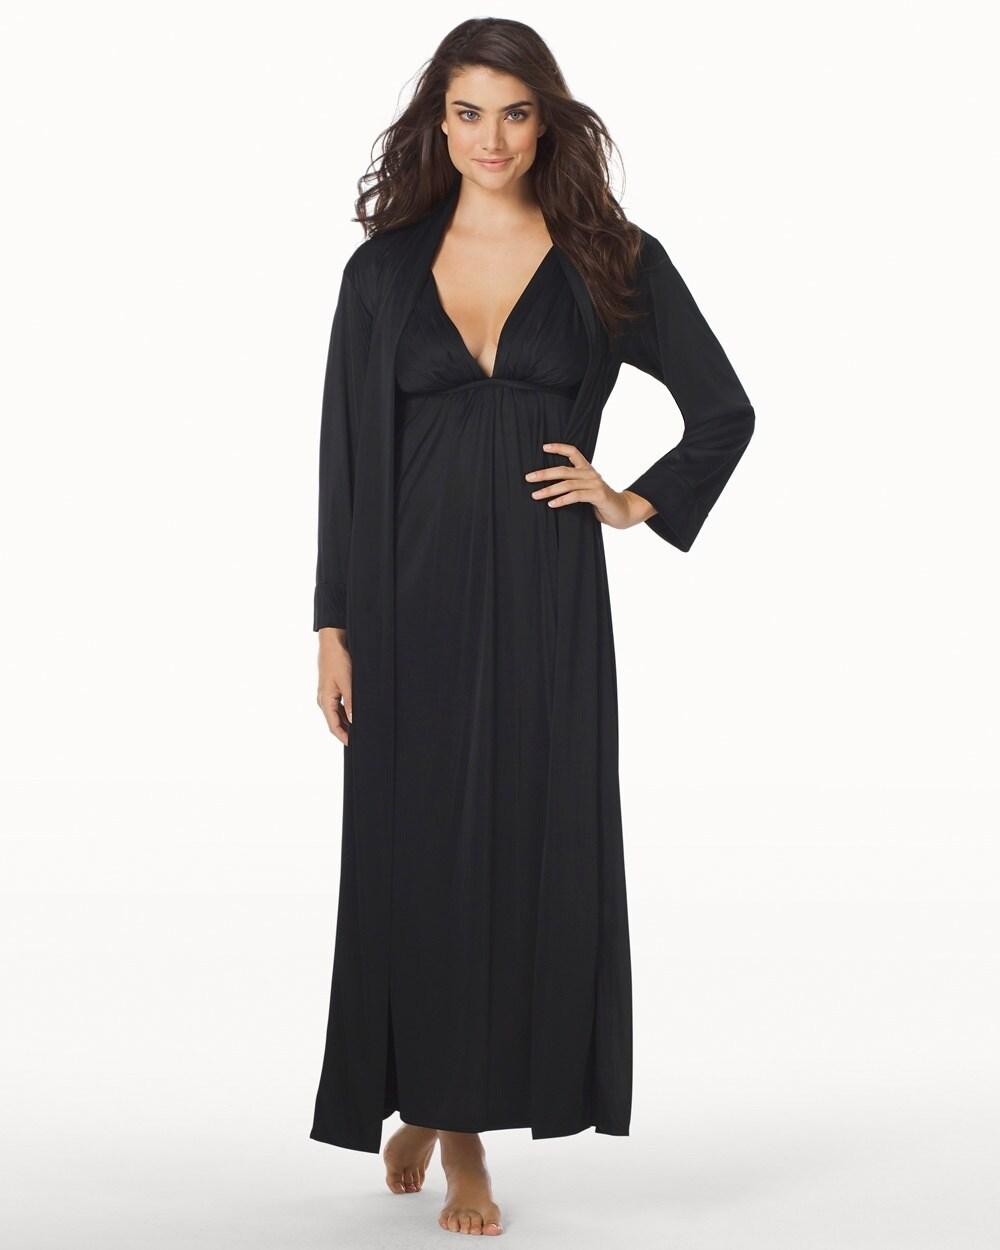 Aphrodite Silky Long Nightgown Black - Soma